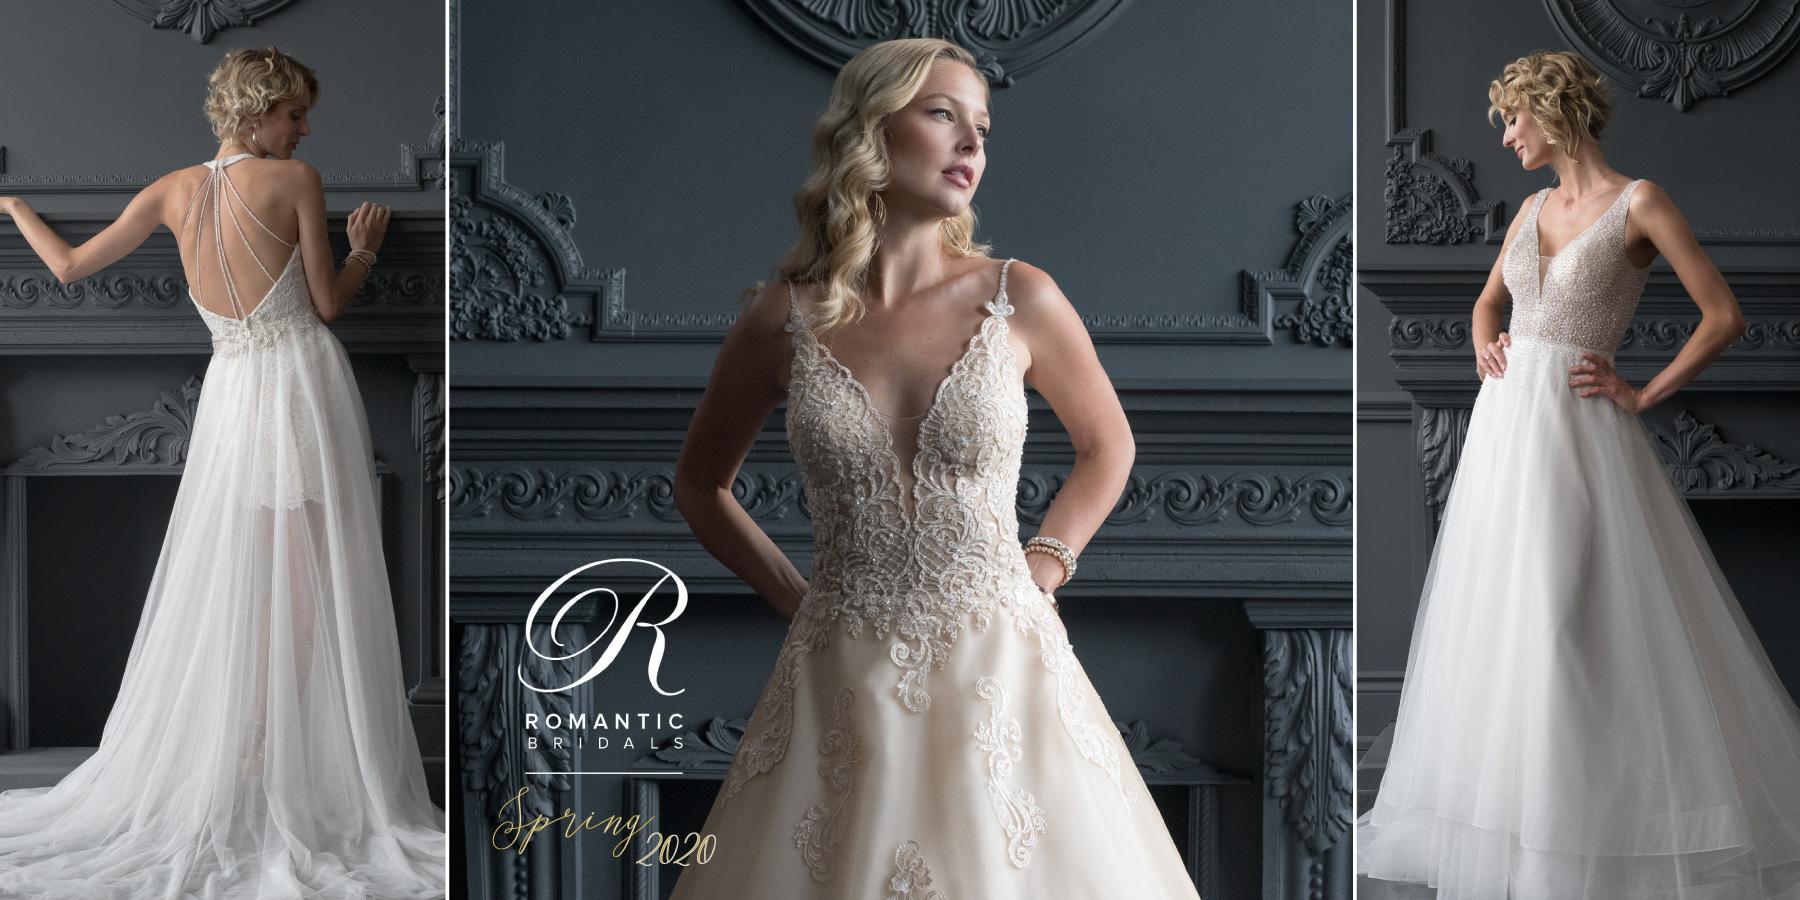 Romantic Bridals Bridal Gowns And Prom Dresses Toronto,Wedding Dresses Usa